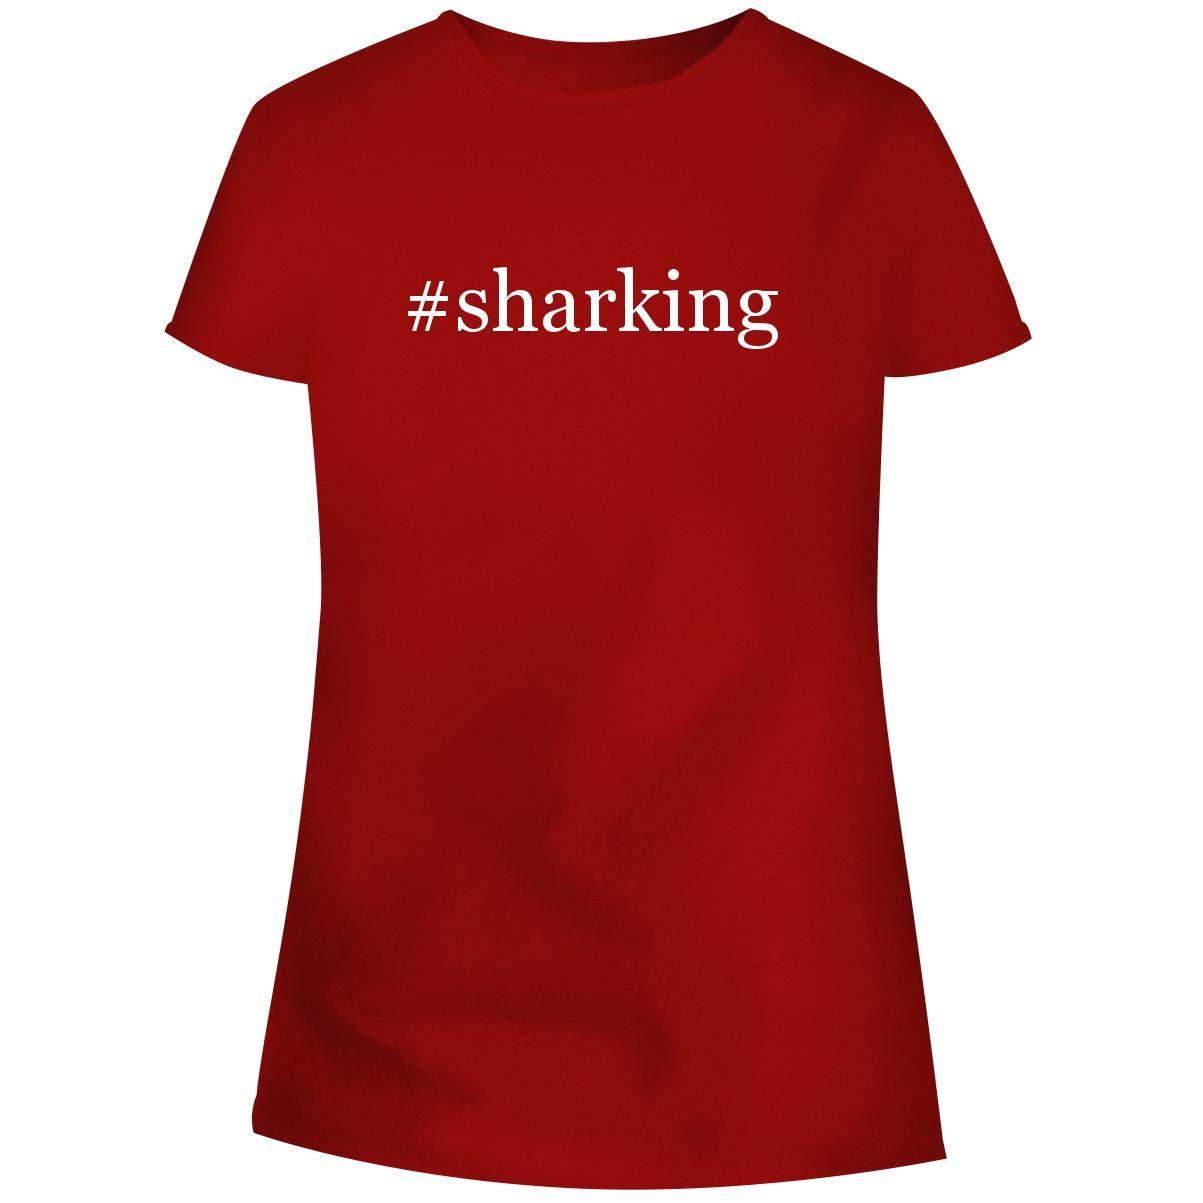 Sharking Hashtag Soft Cut Adult Tee T Shirt 7662